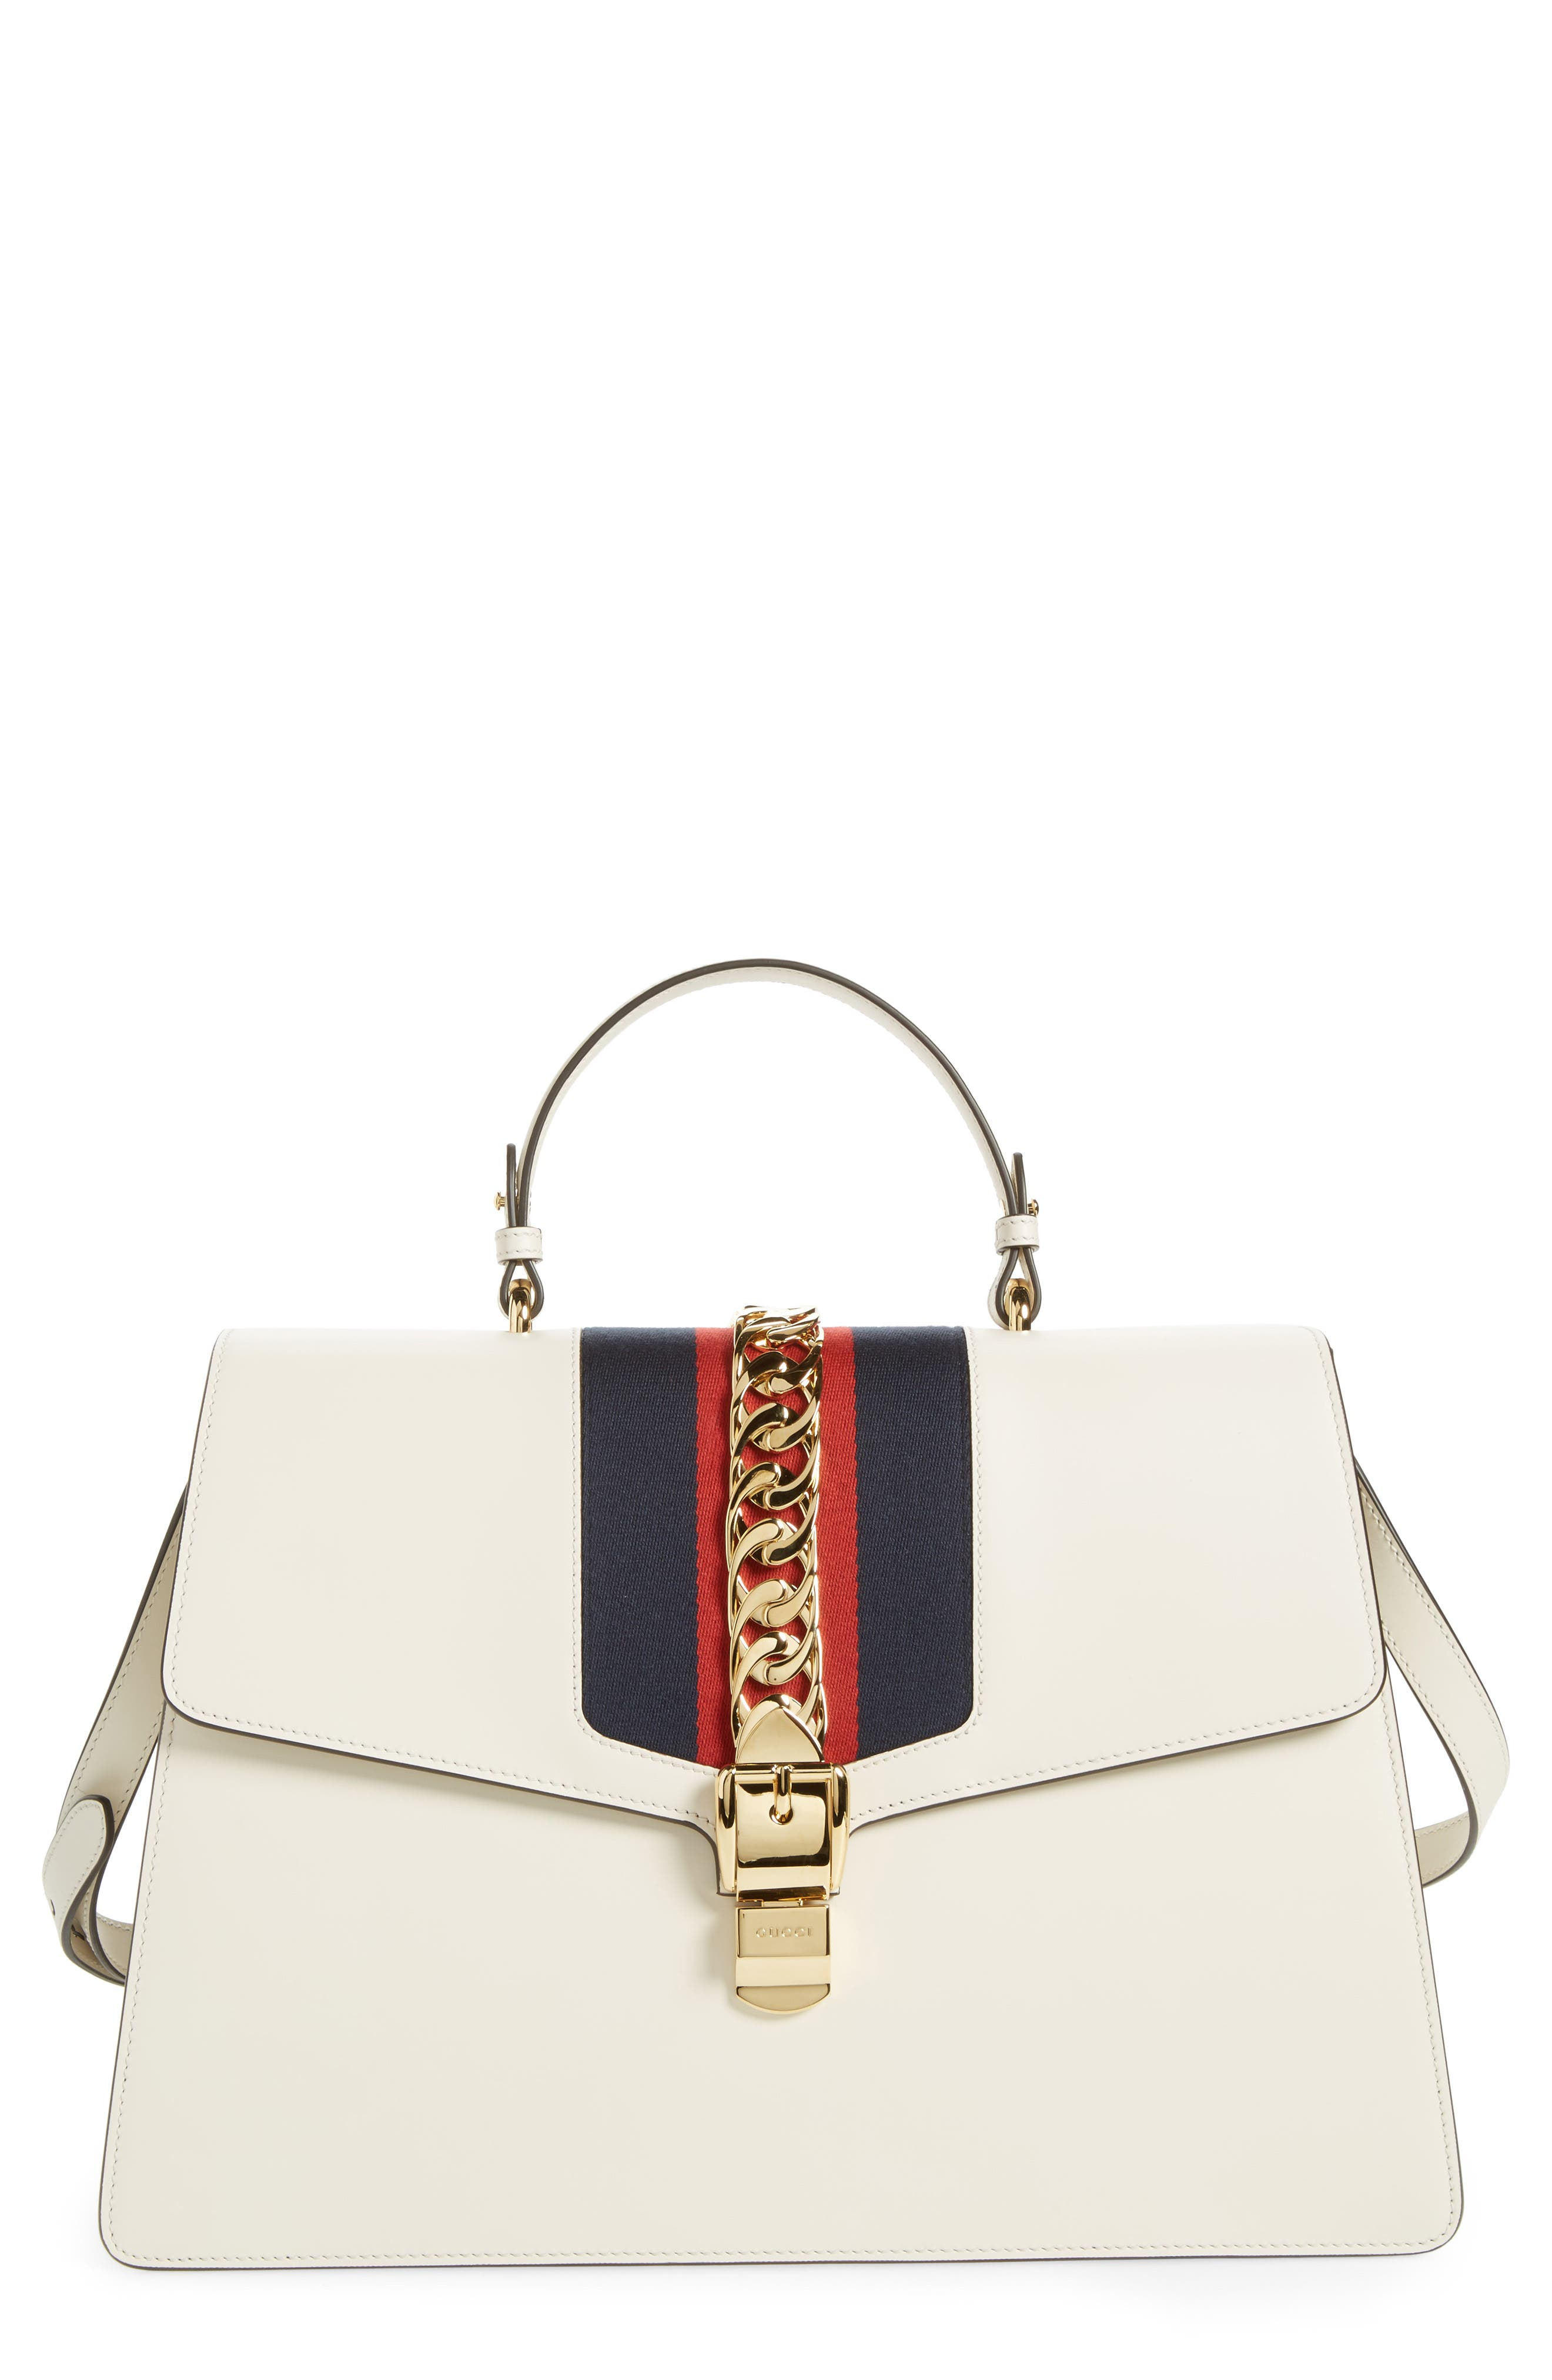 Maxi Sylvie Top Handle Leather Shoulder Bag,                         Main,                         color, MYSTIC WHITE/ BLUE RED